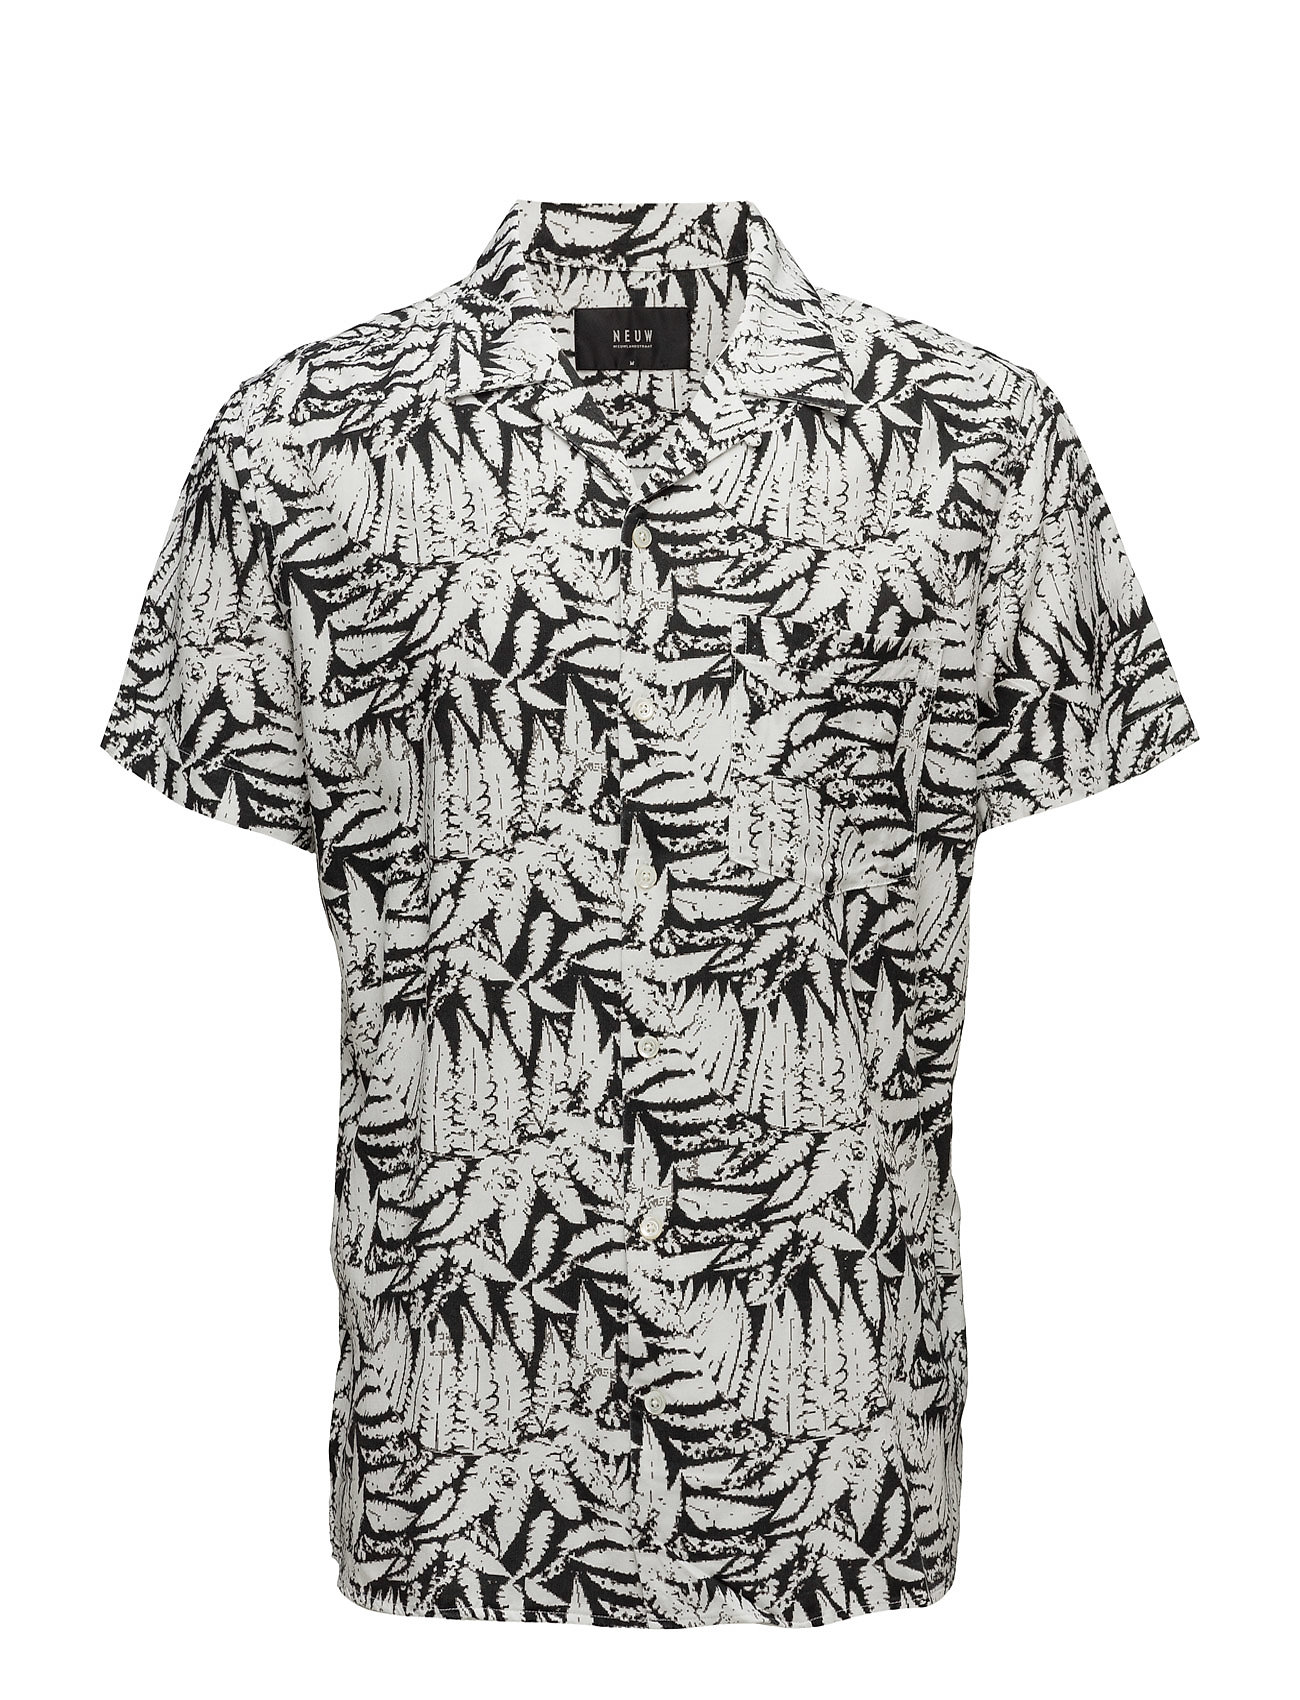 neuw – Tribe shirt fra boozt.com dk